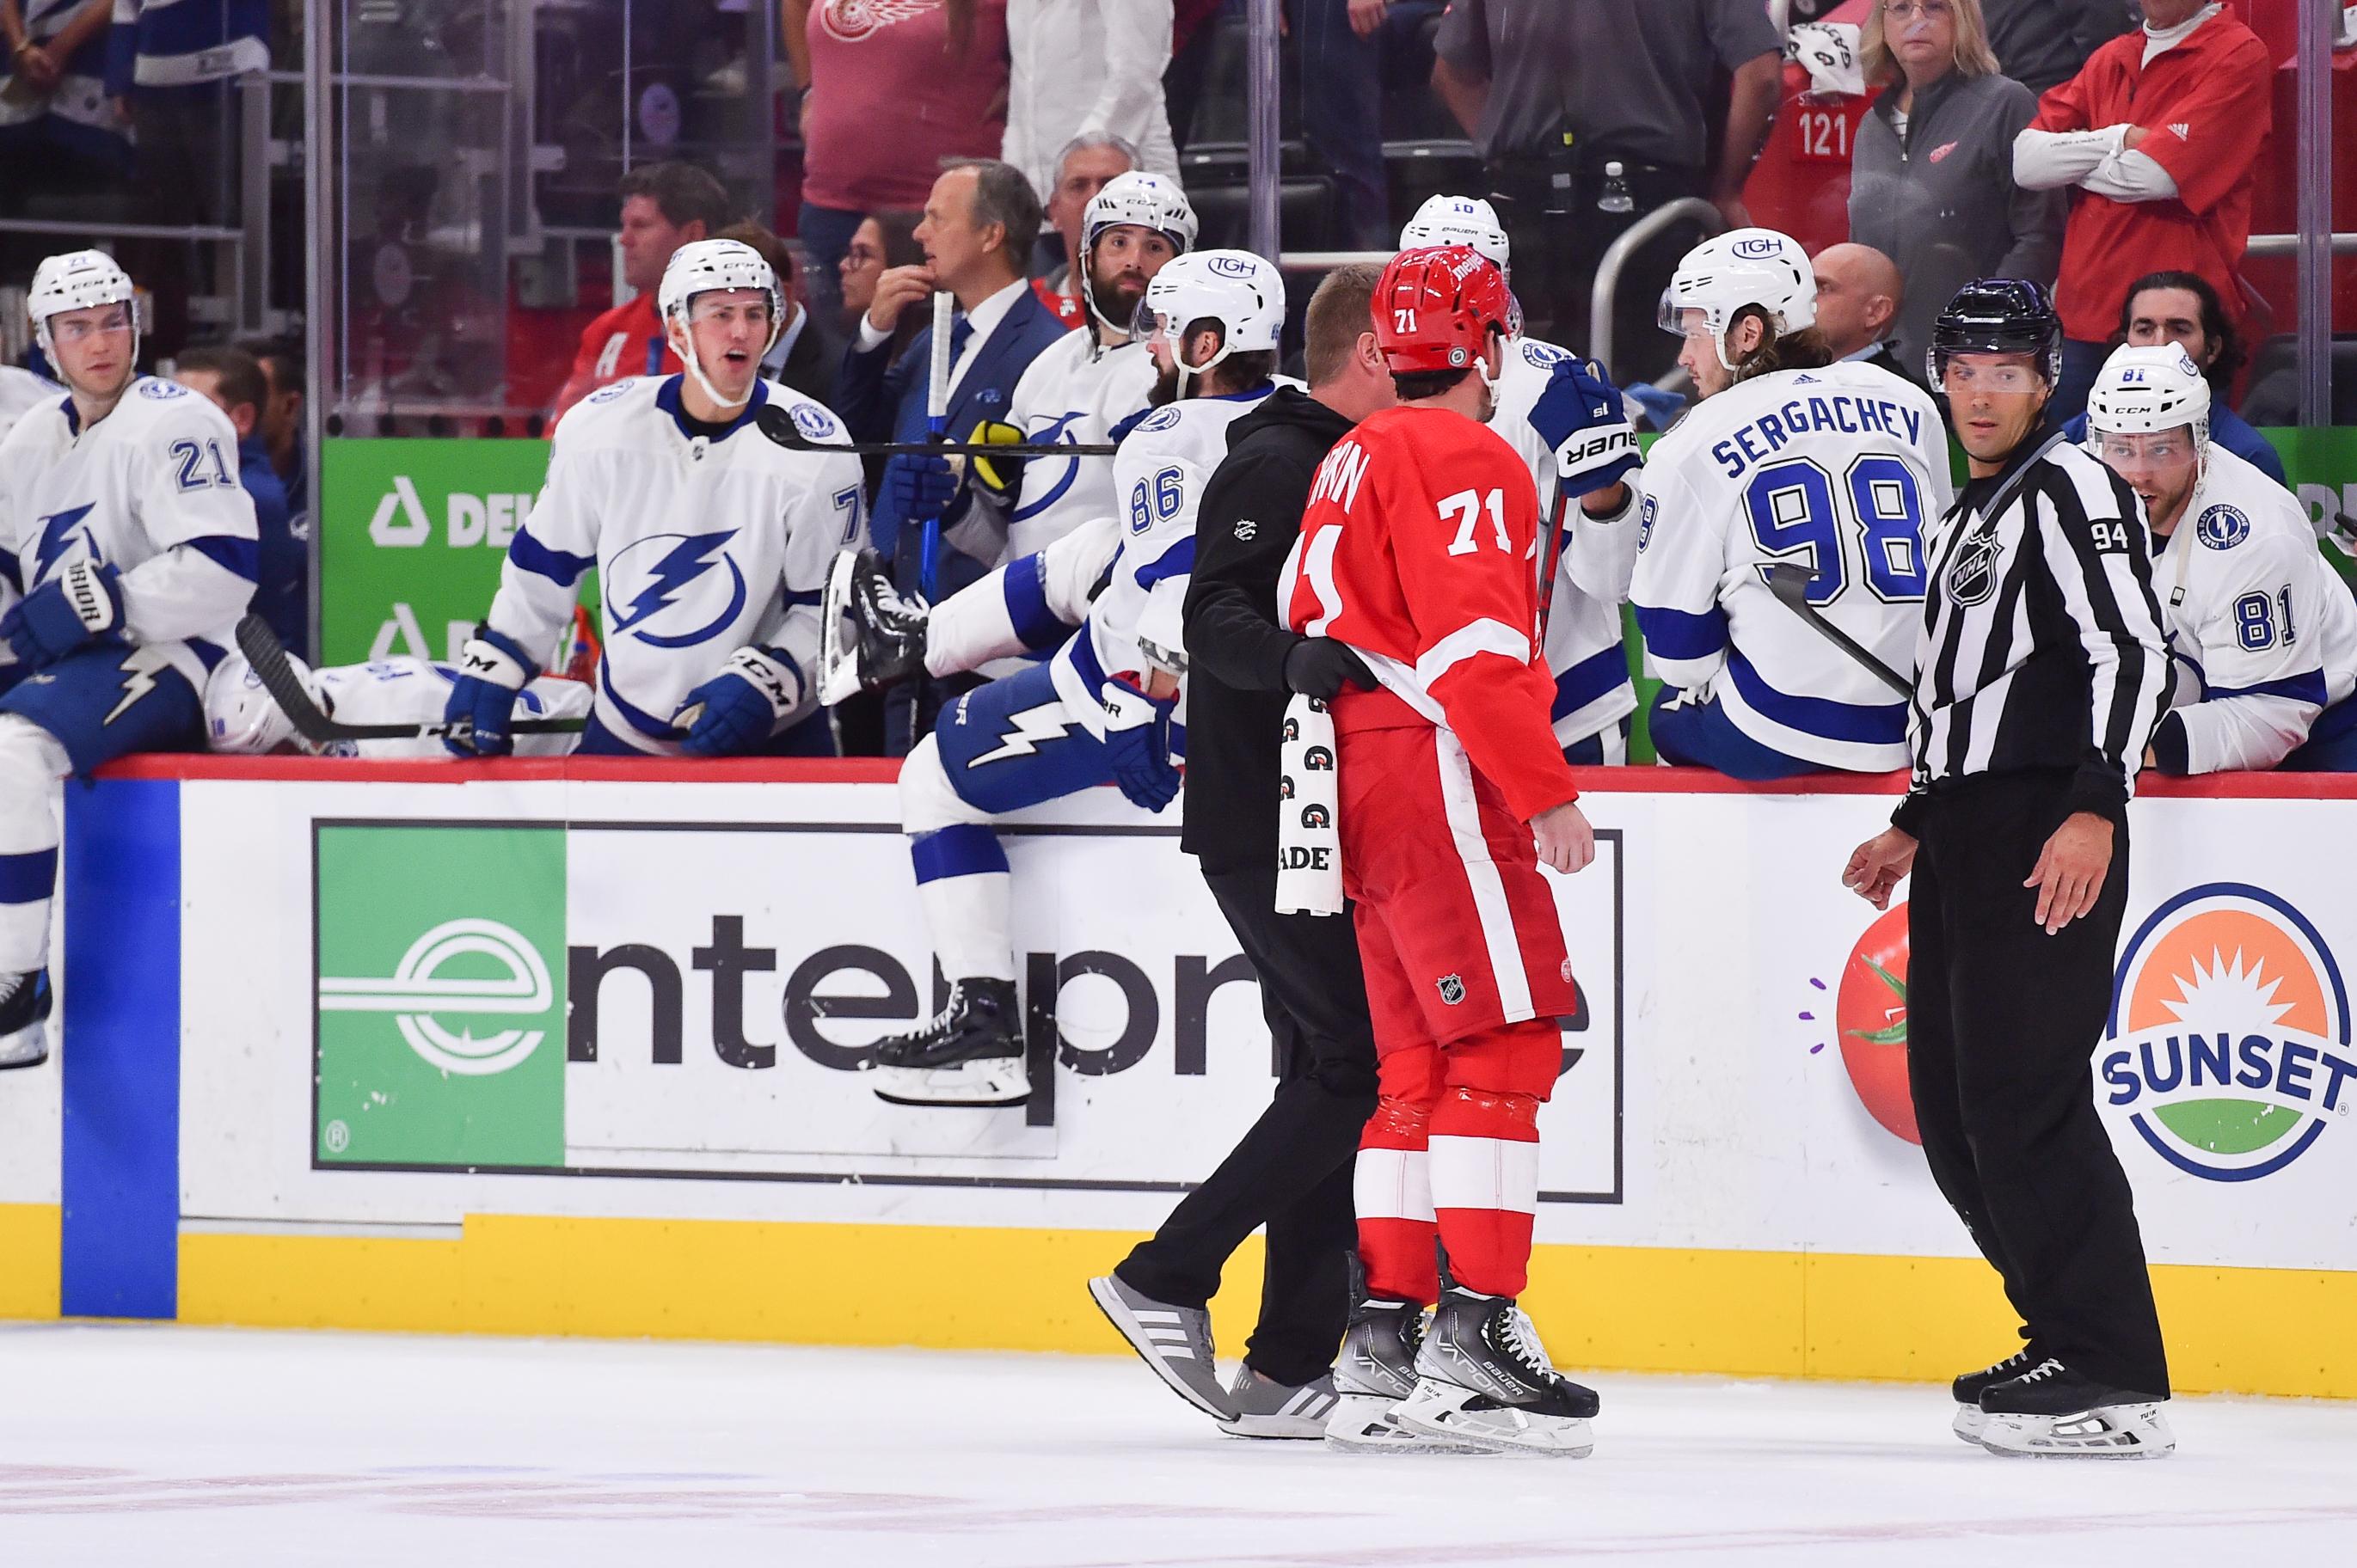 NHL: OCT 14 Lightning at Red Wings